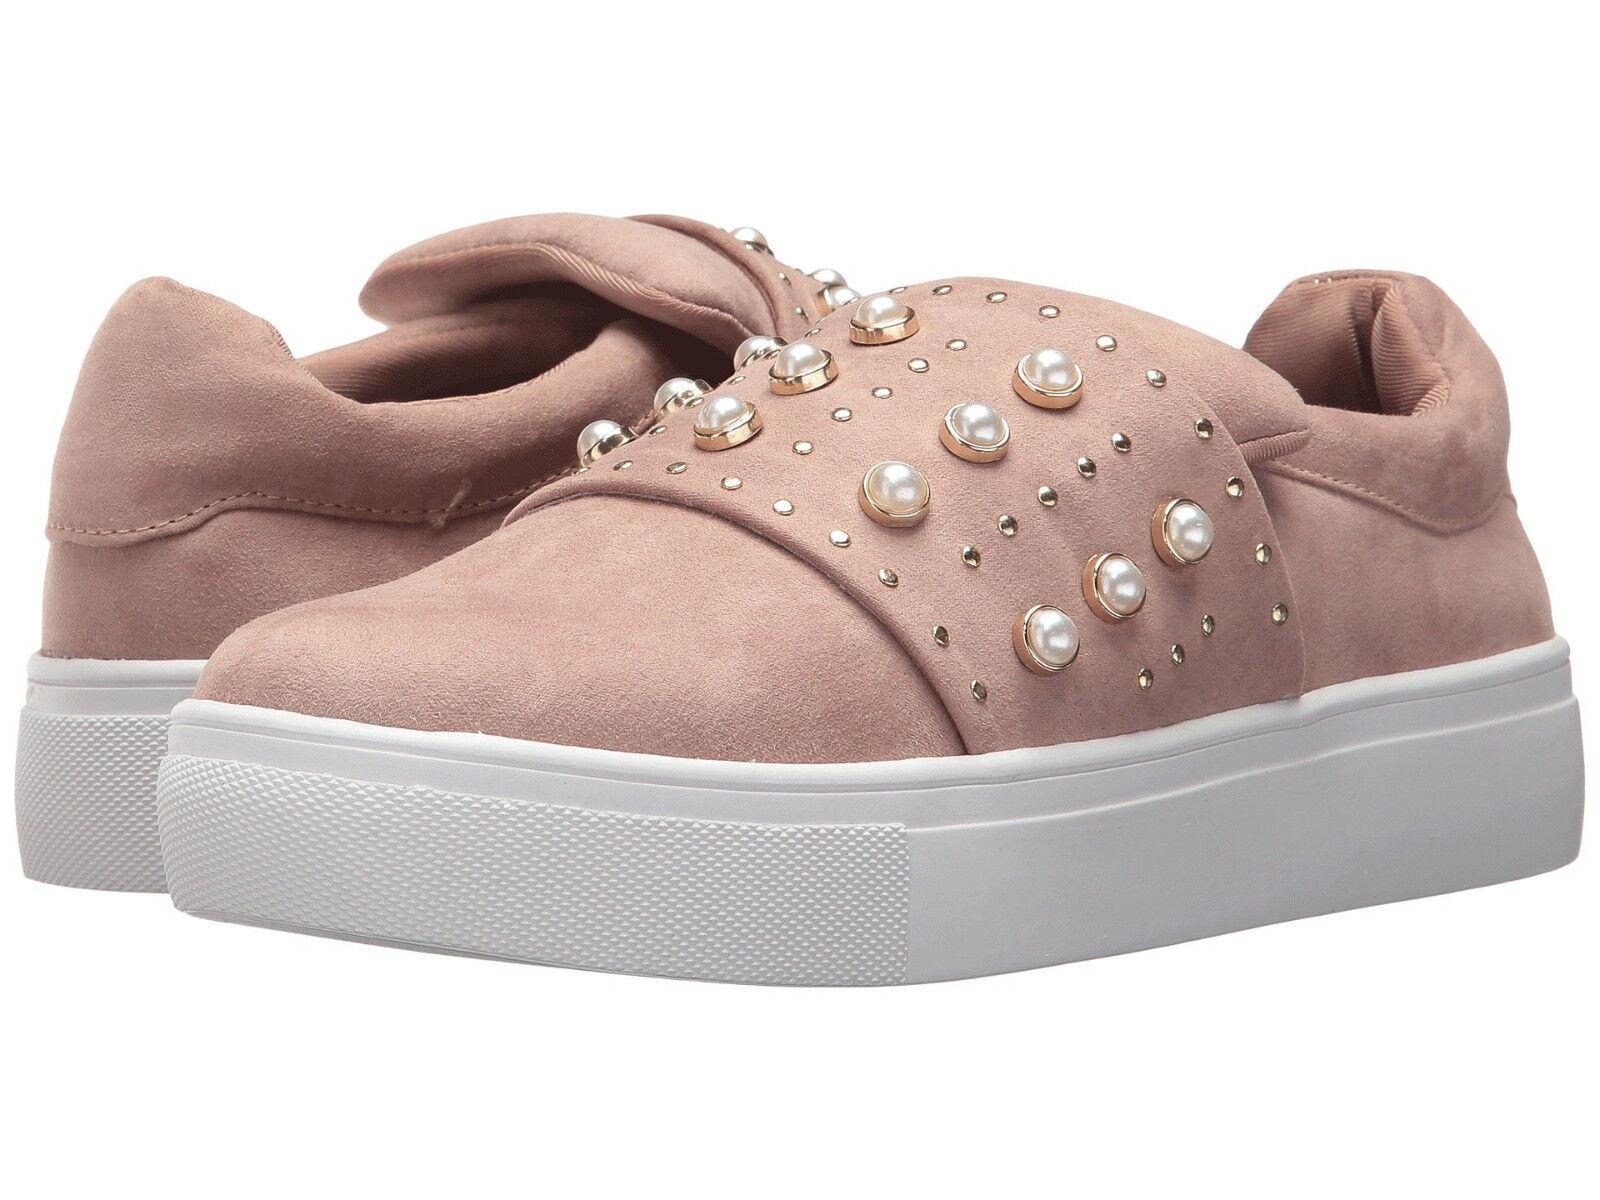 NIB Steve Madden Women's Deylin Studded Fashion Sneakers in Blush